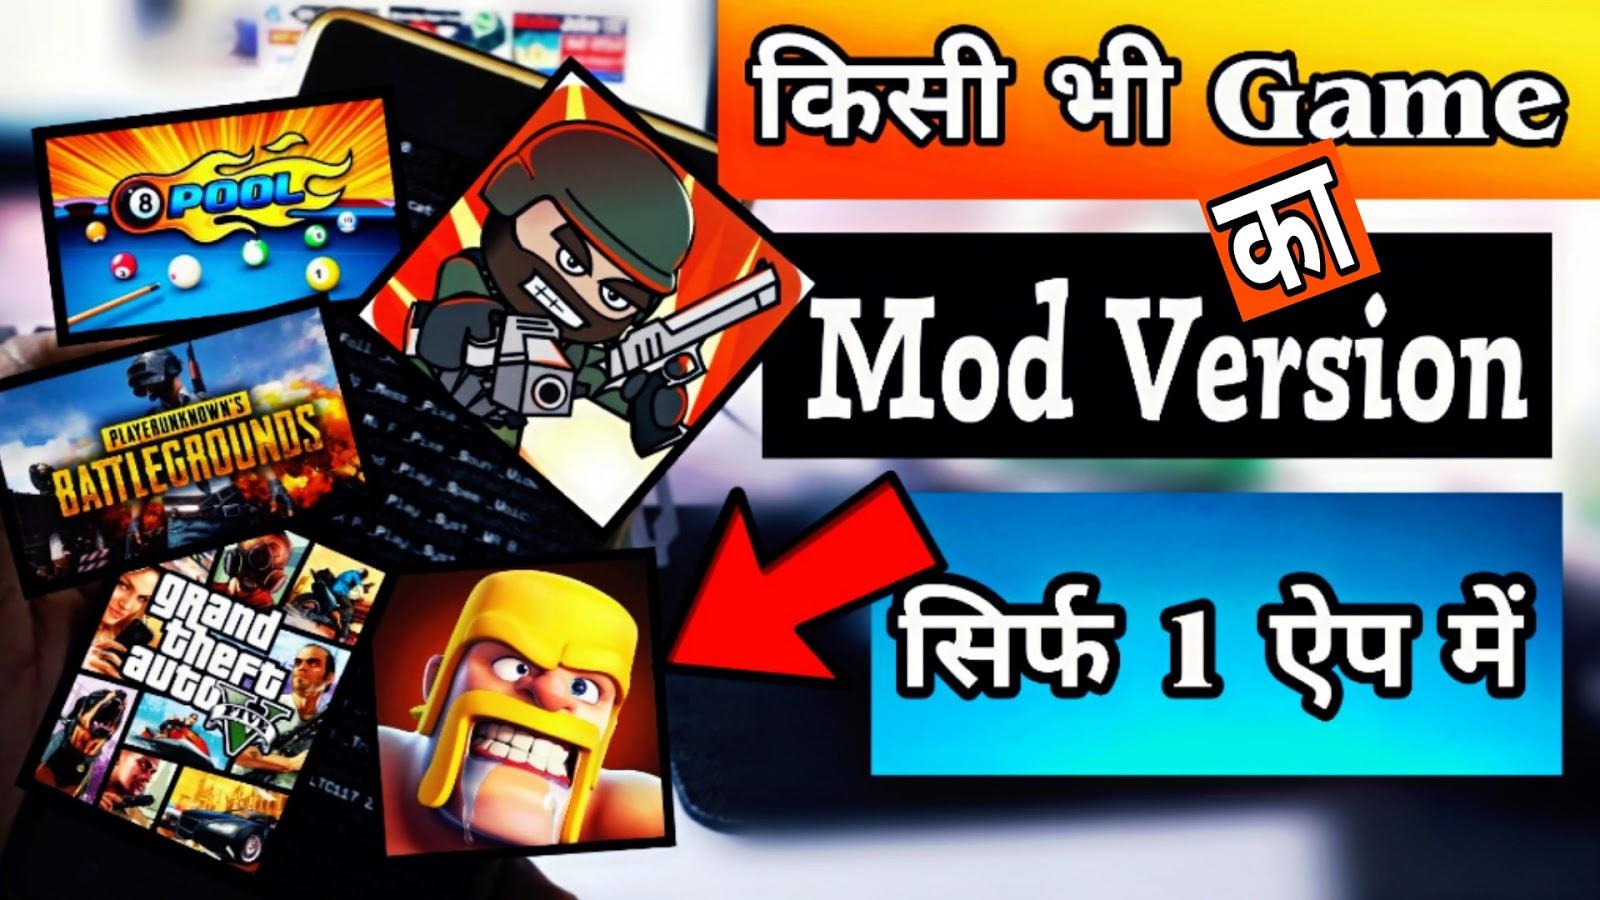 Happy Mod Download - Mod Apk Download 100% Working Mods ...